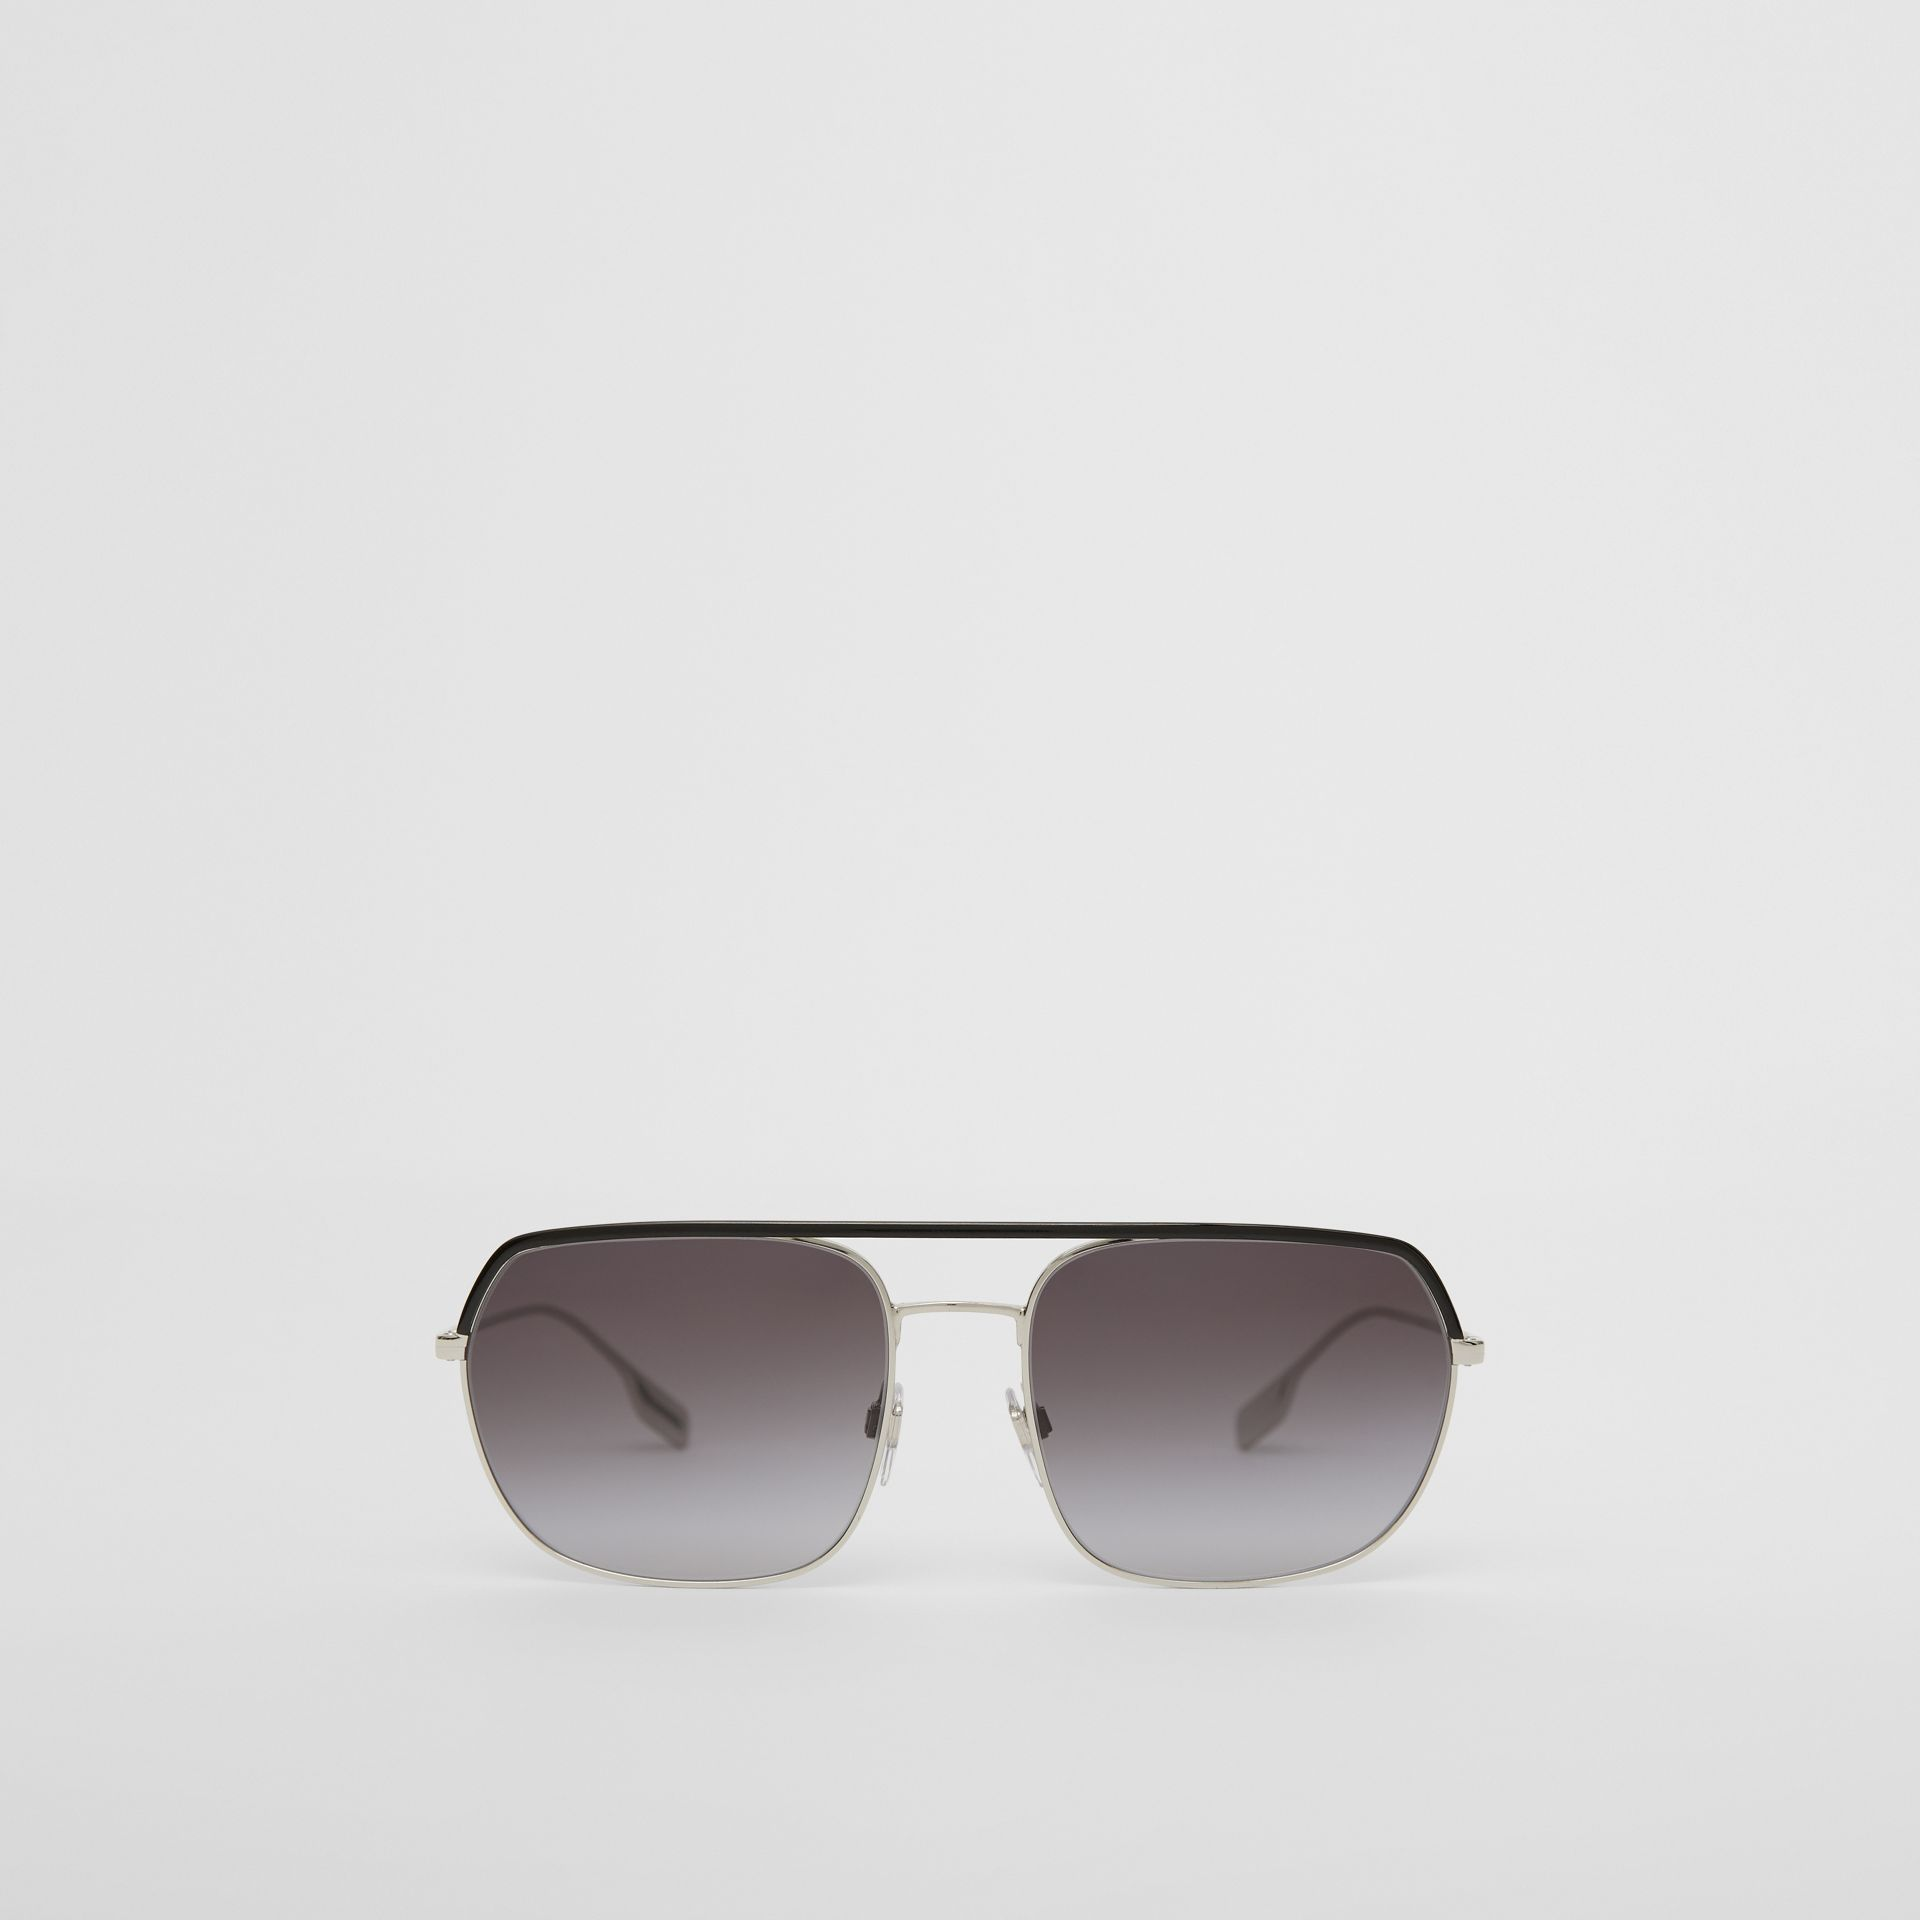 Square Pilot Sunglasses in Black - Men | Burberry - gallery image 0